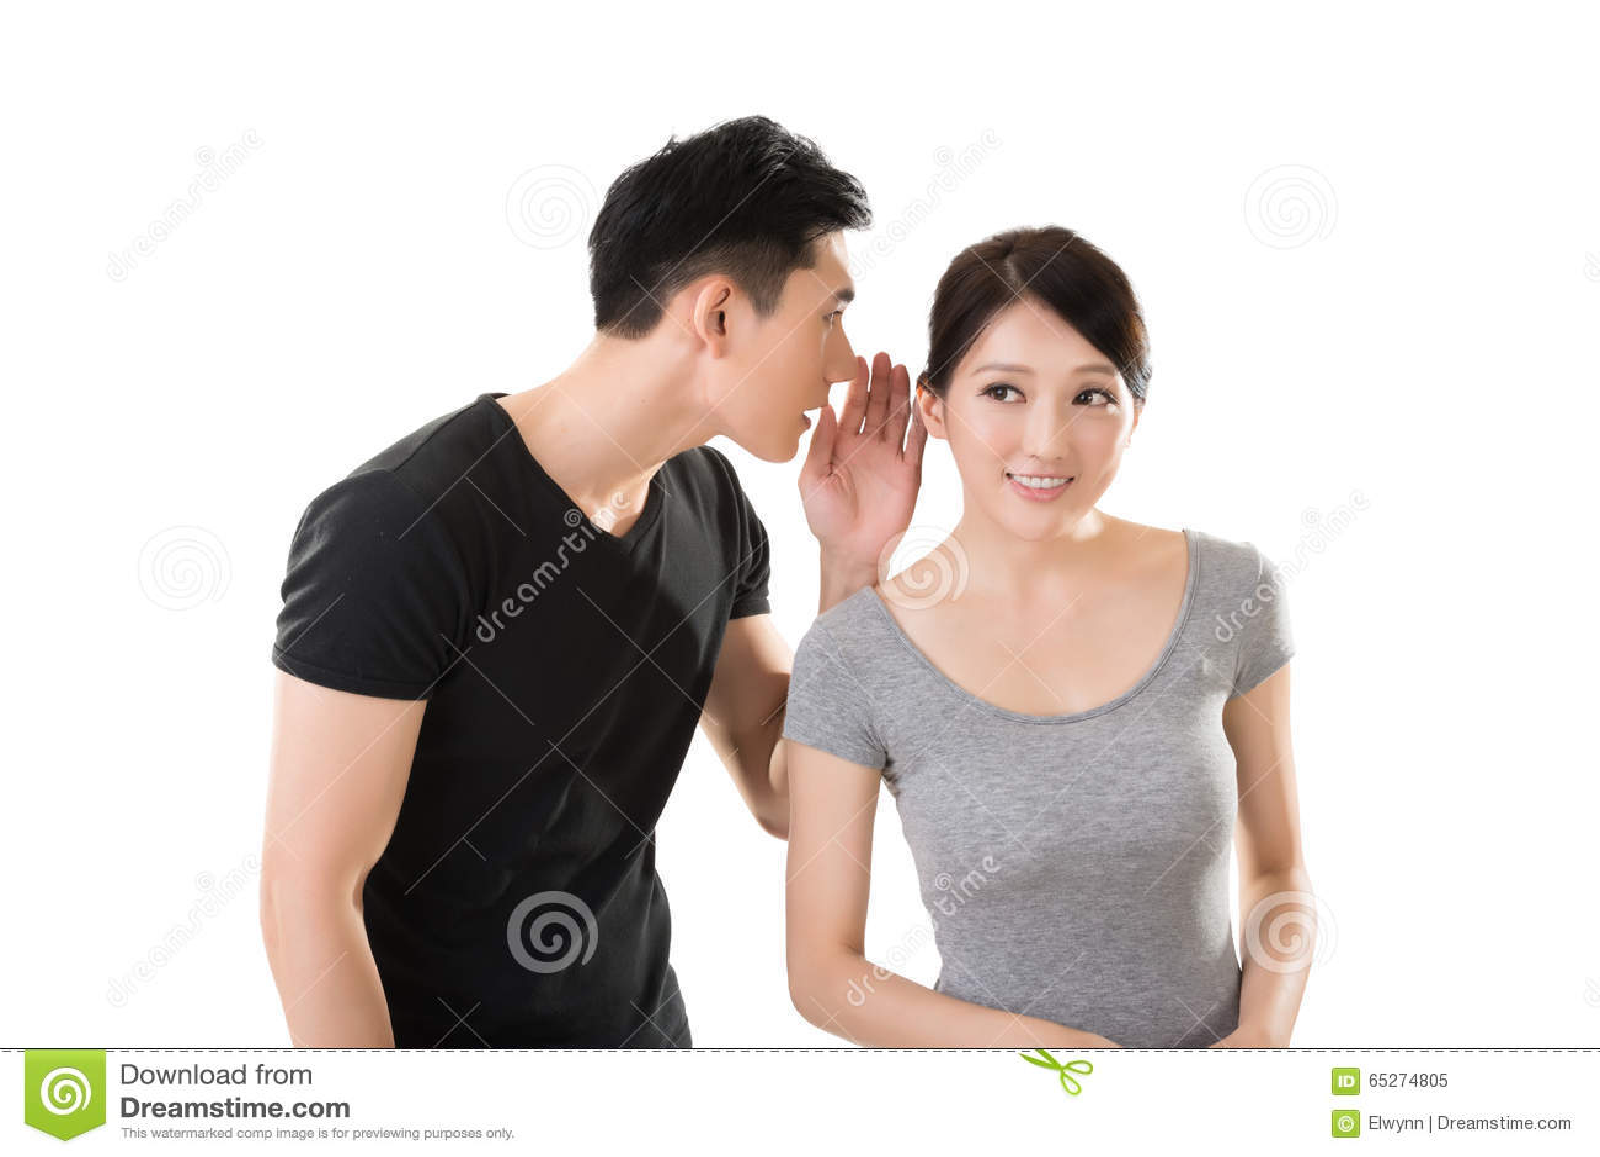 datant d'un jeune homme coréen mariage ne datant pas 16. Bölüm yeppudaa